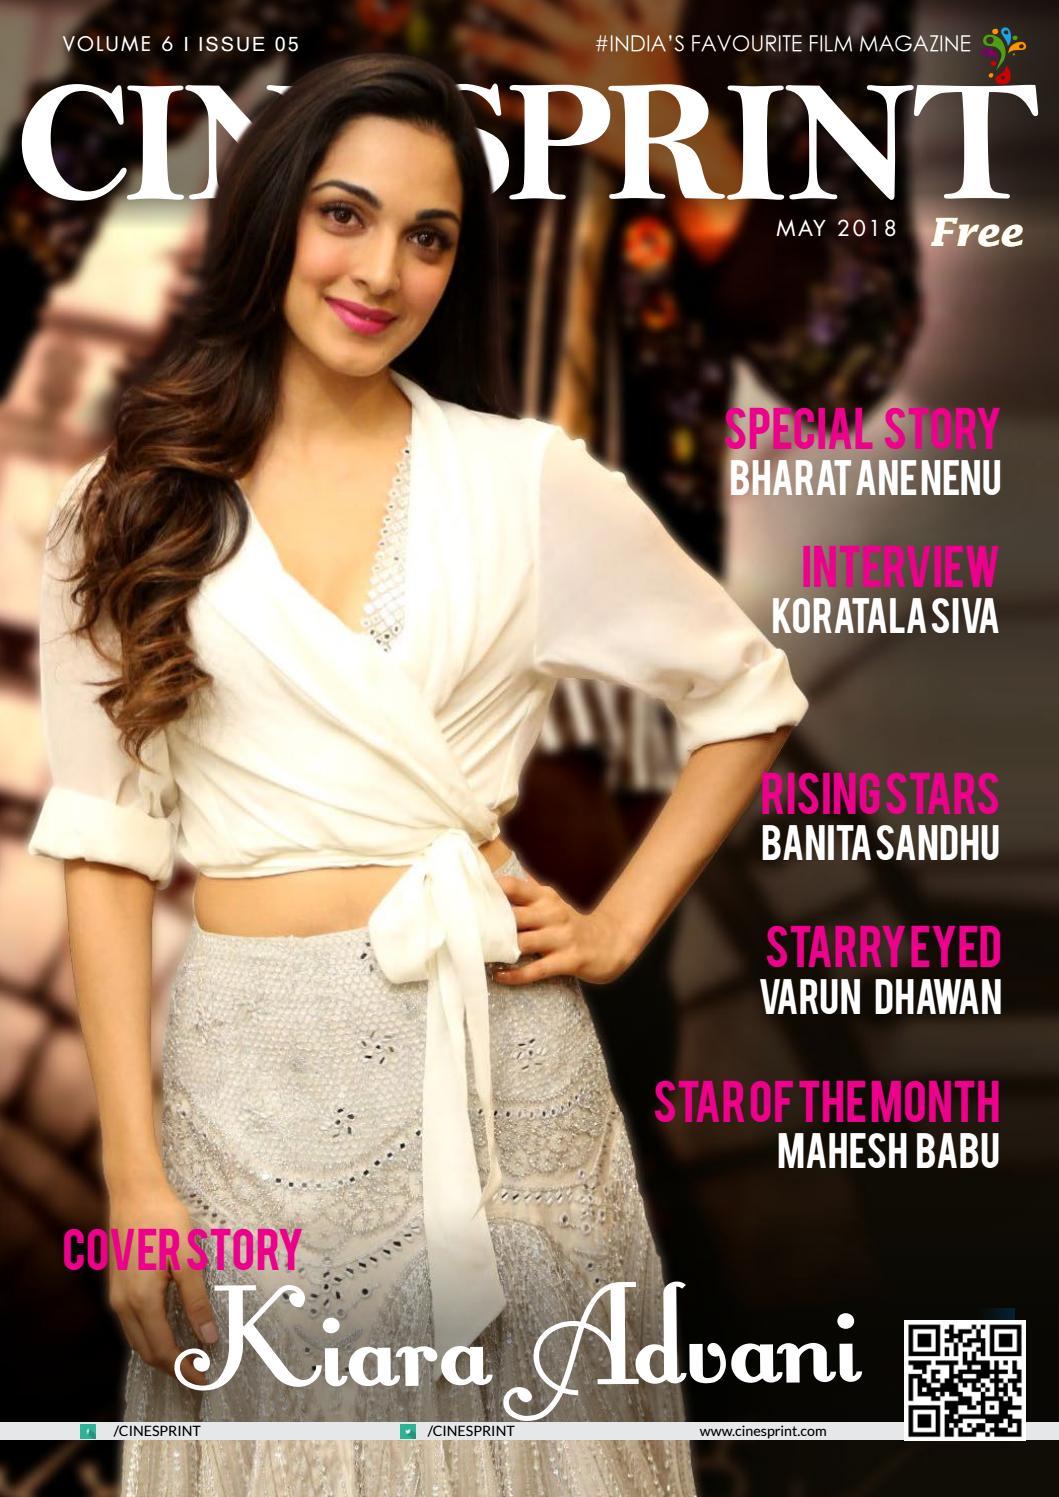 4bfddbbf446b Cinesprint Magazine May 2018 by Wishesh Digital Media Pvt Ltd - issuu